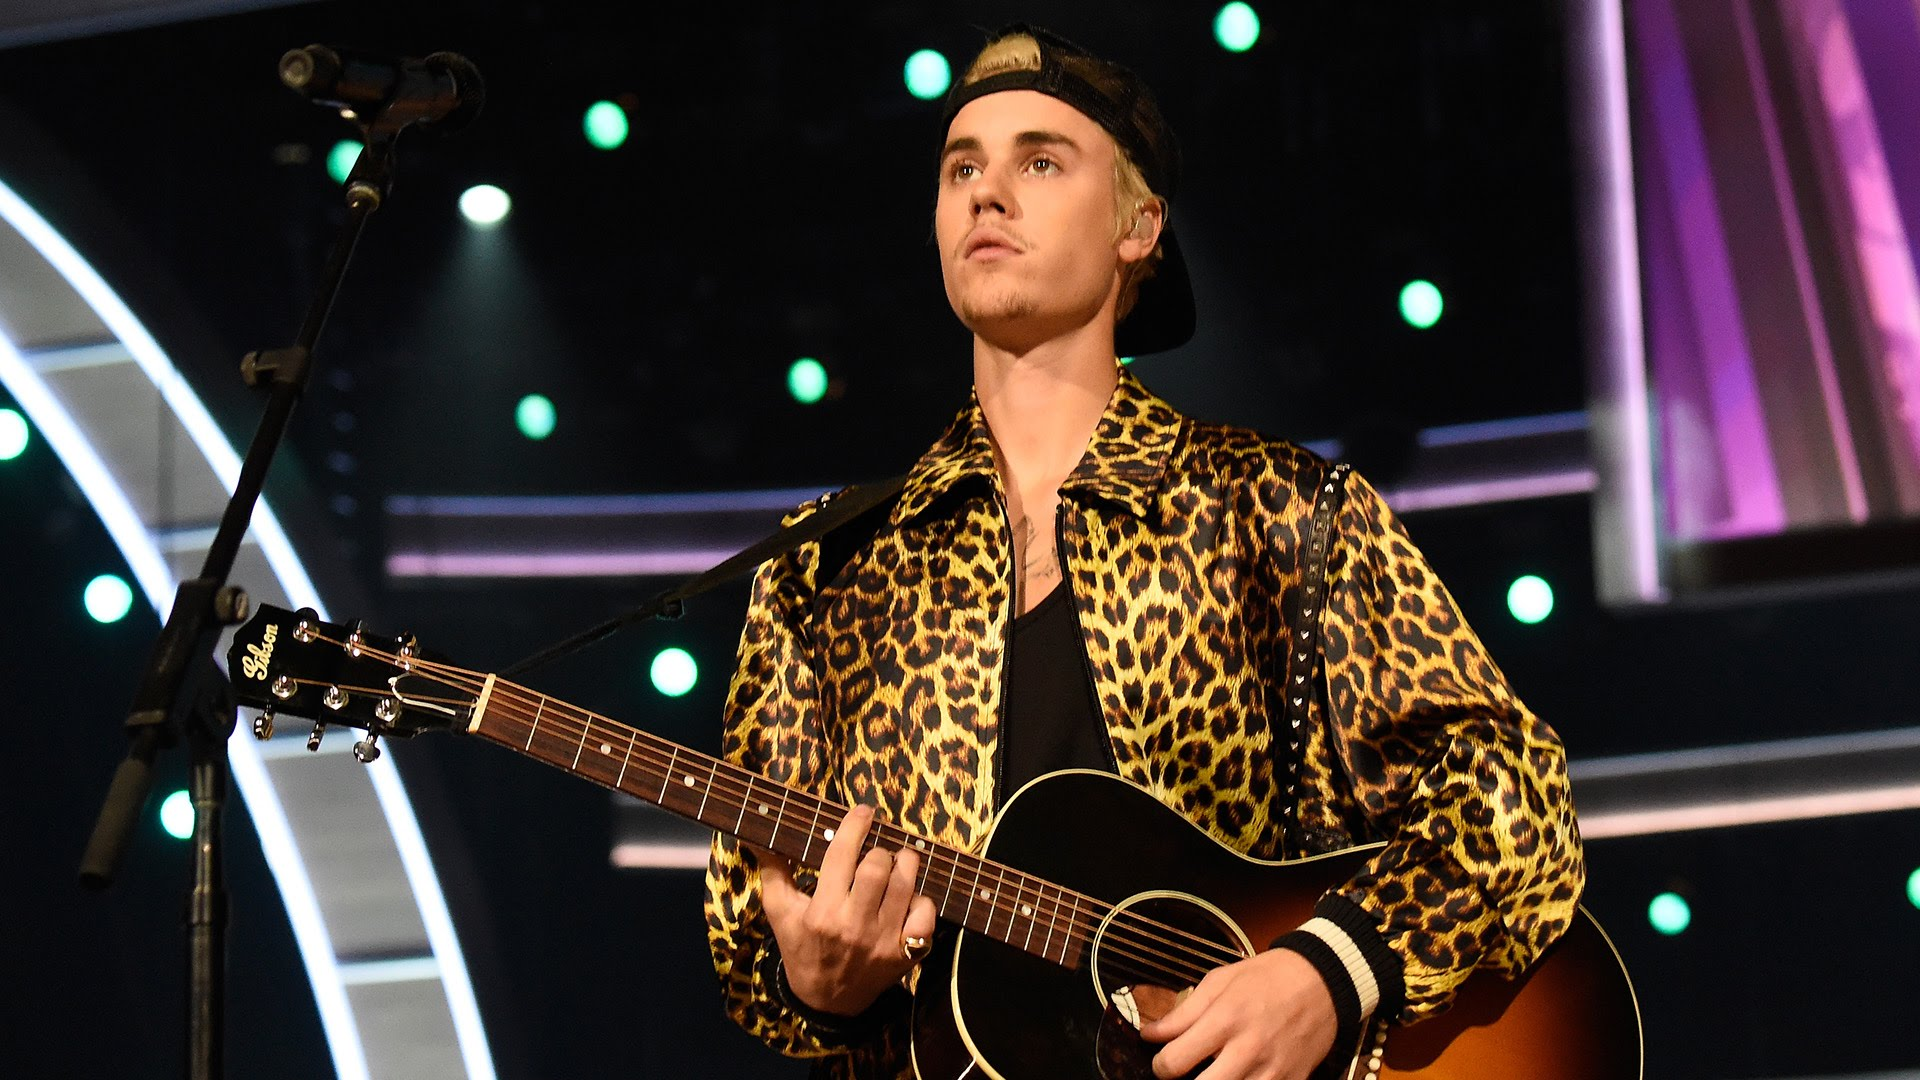 Justin Bieber Wallpapers 2018